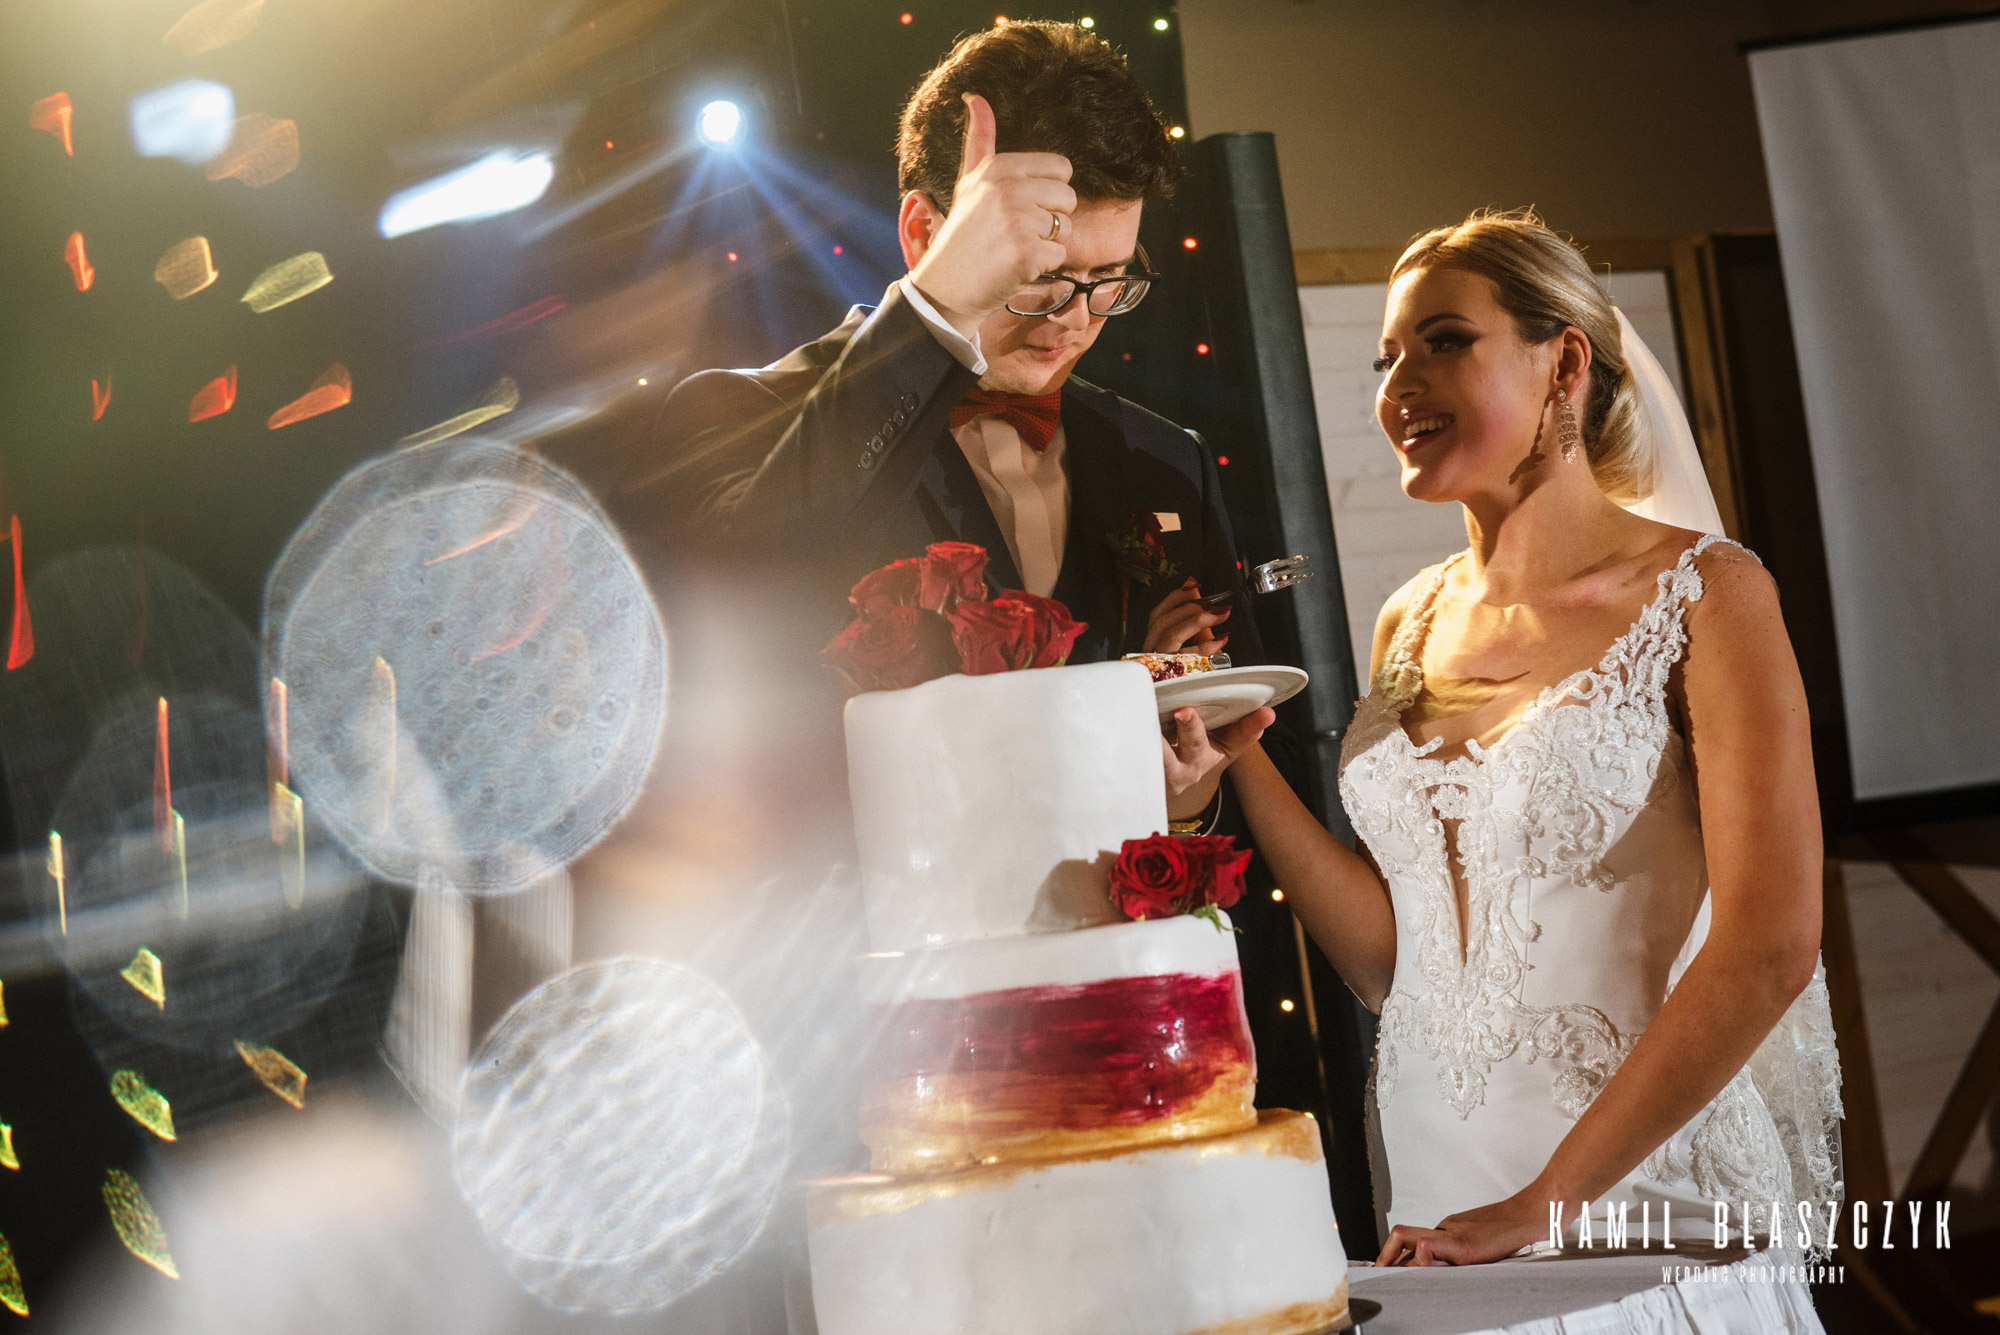 Para młoda podczas krojenia tortu weselnego naked cake